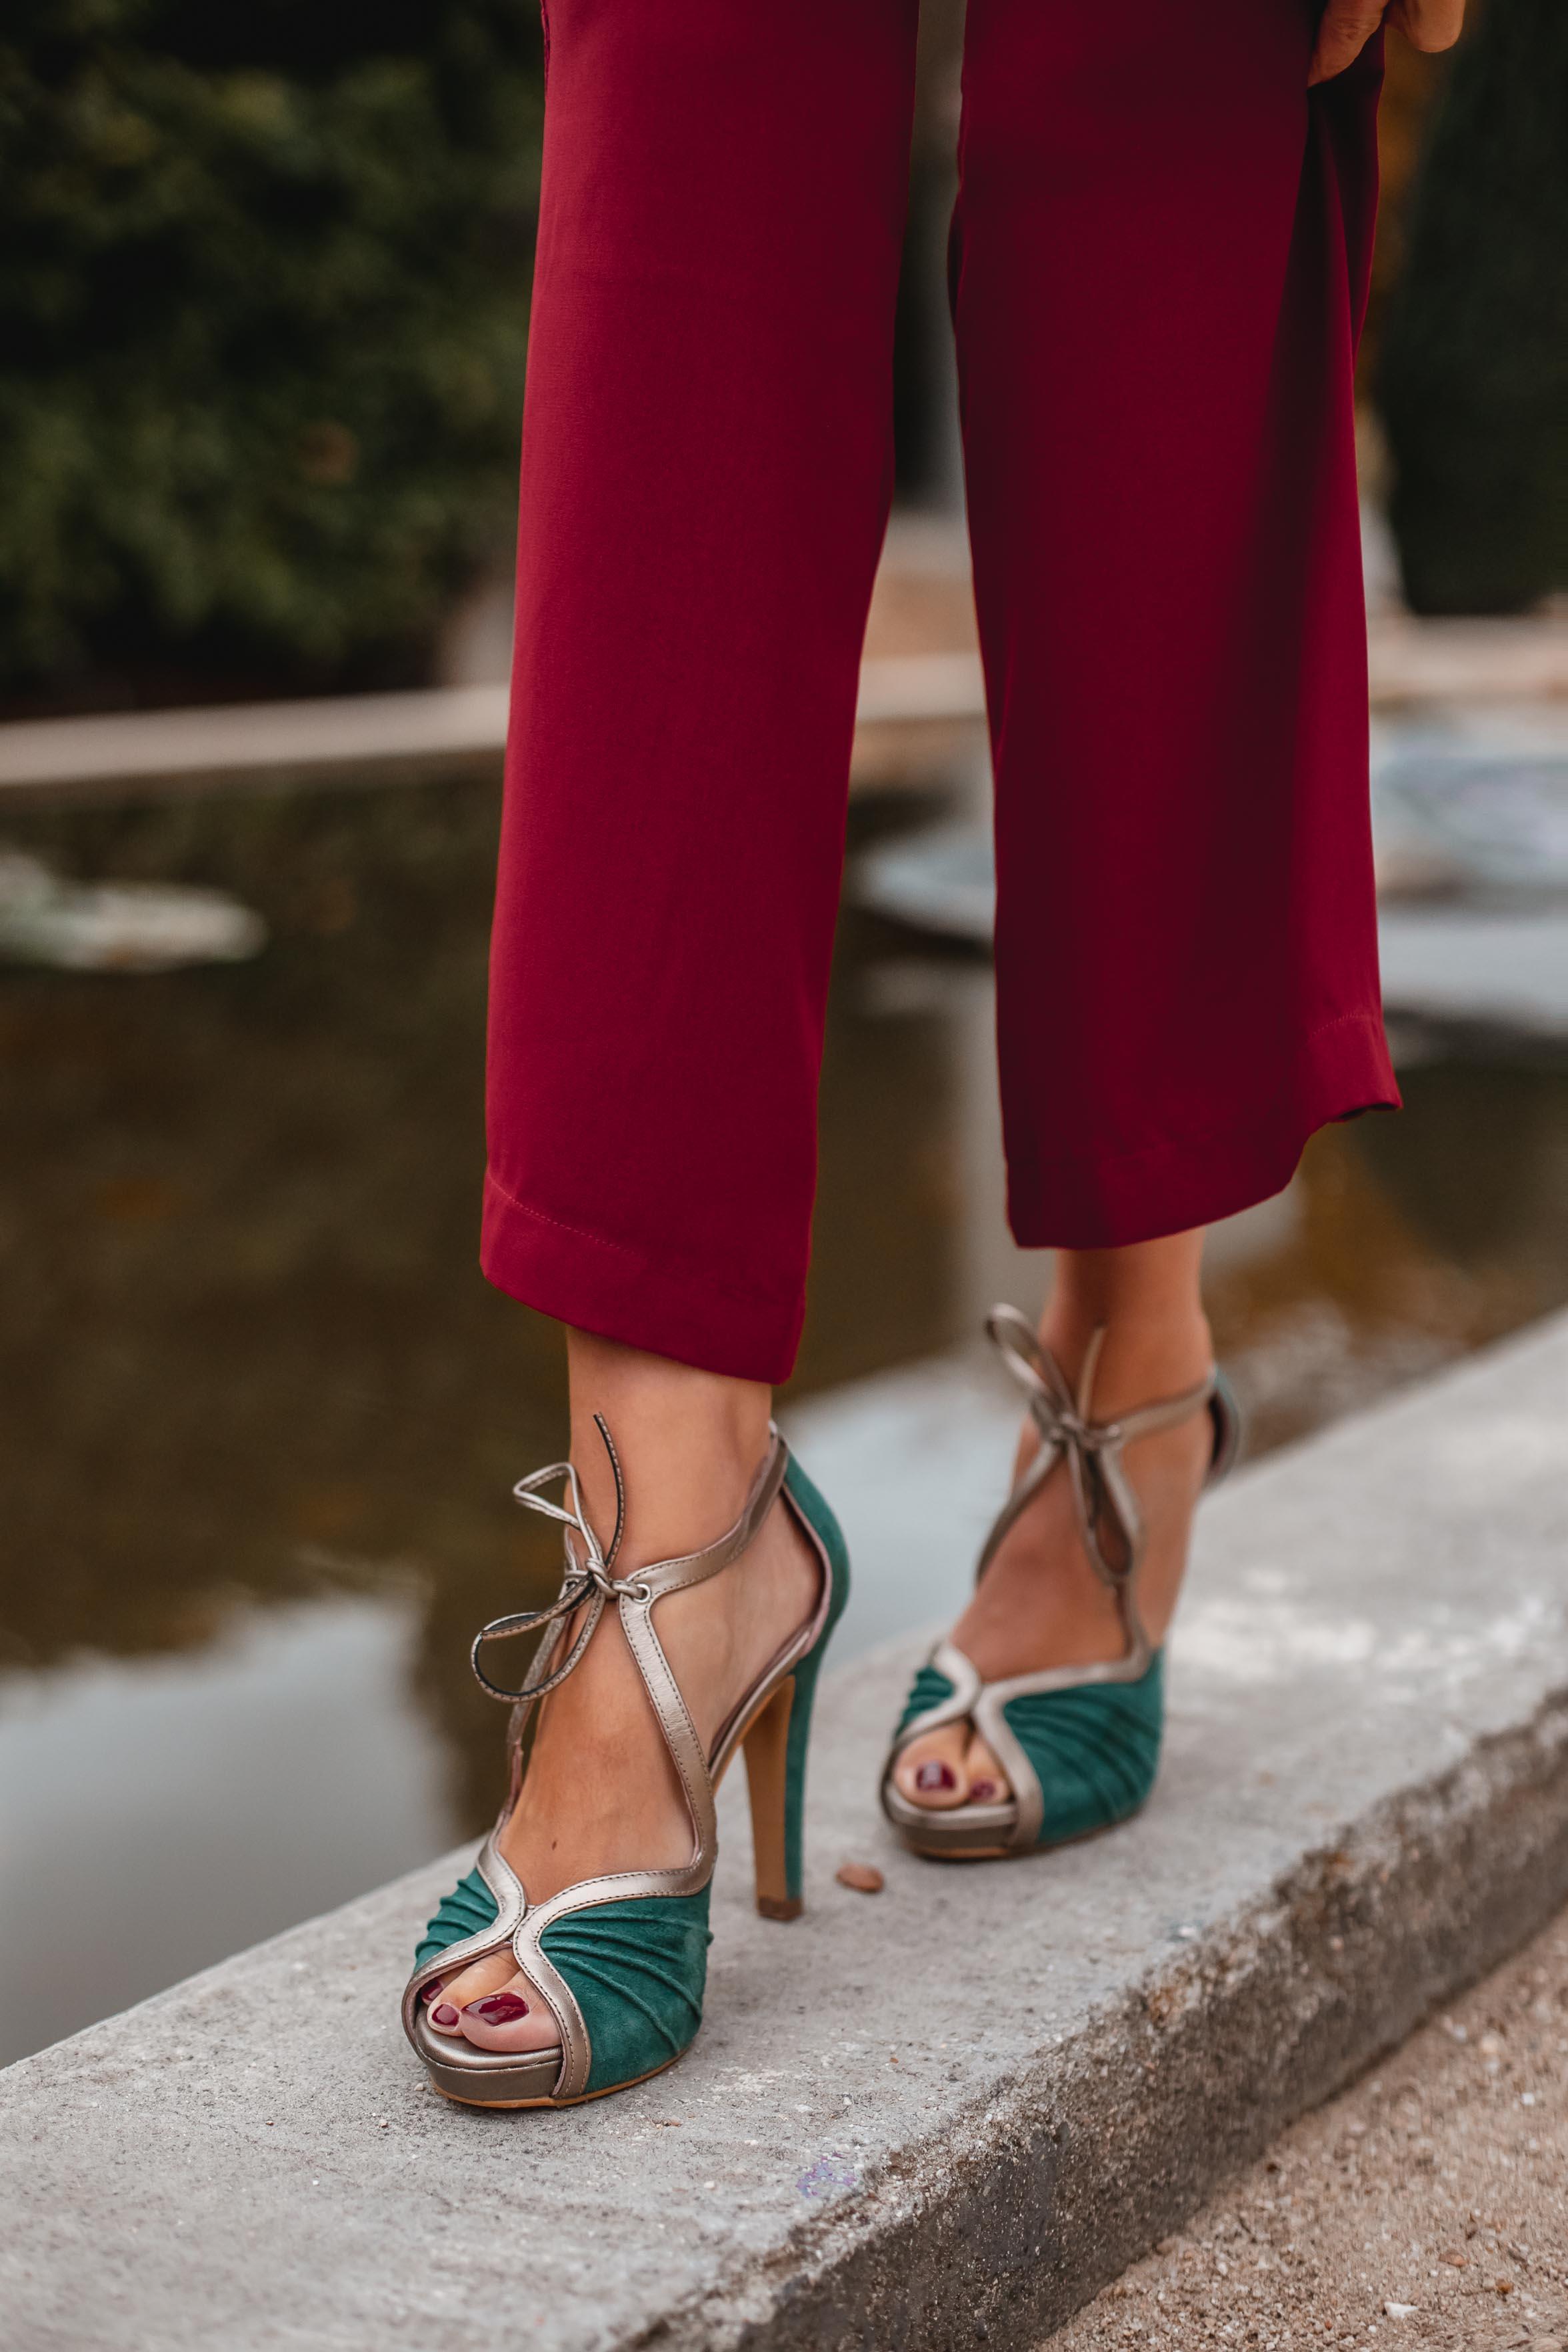 zapatos verde invitada boda